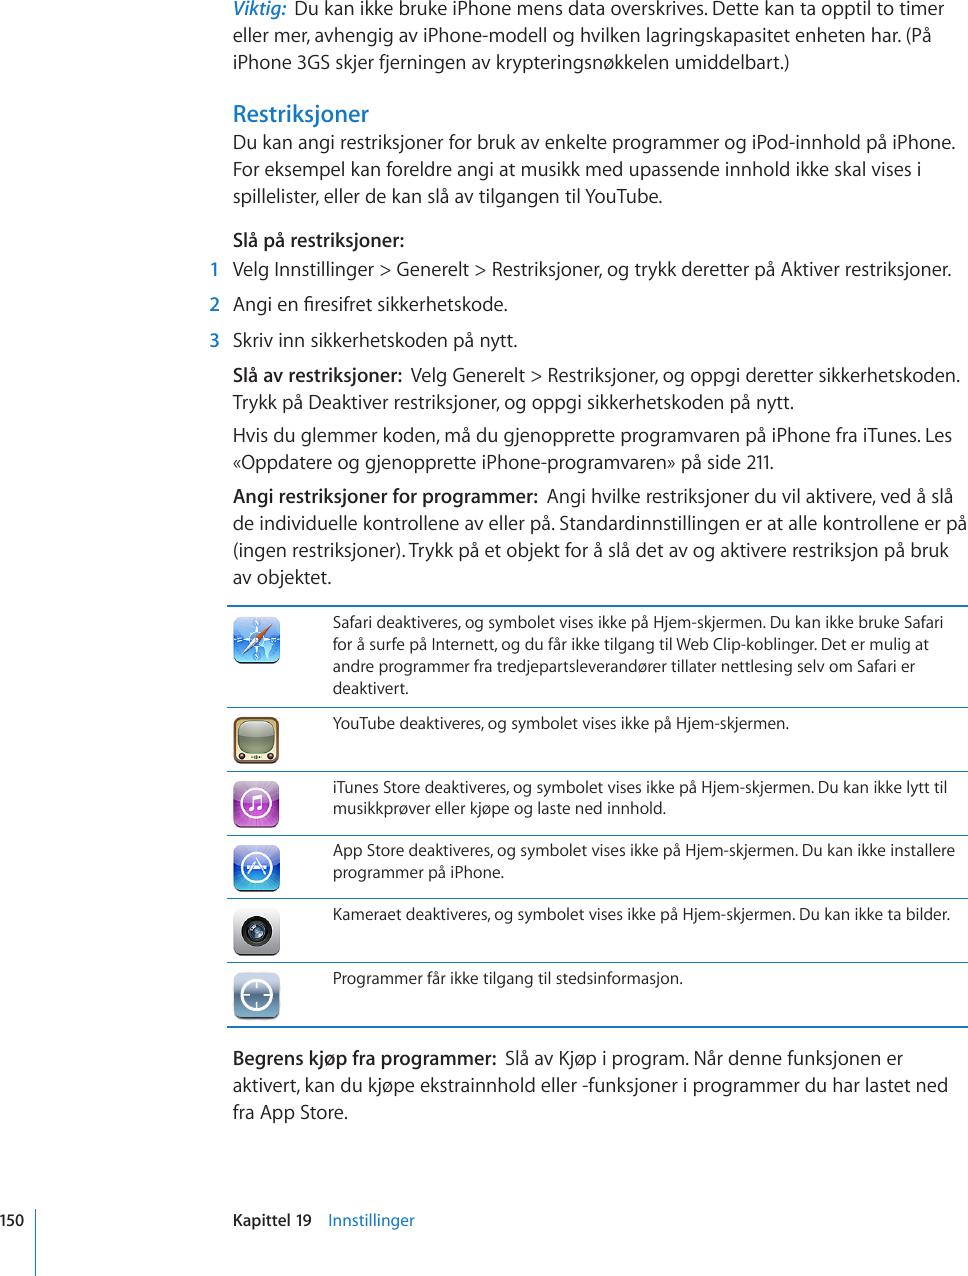 dde29ca04 Apple IPhone Brukerhåndbok User Manual I Phone (for OS 3.1 ...